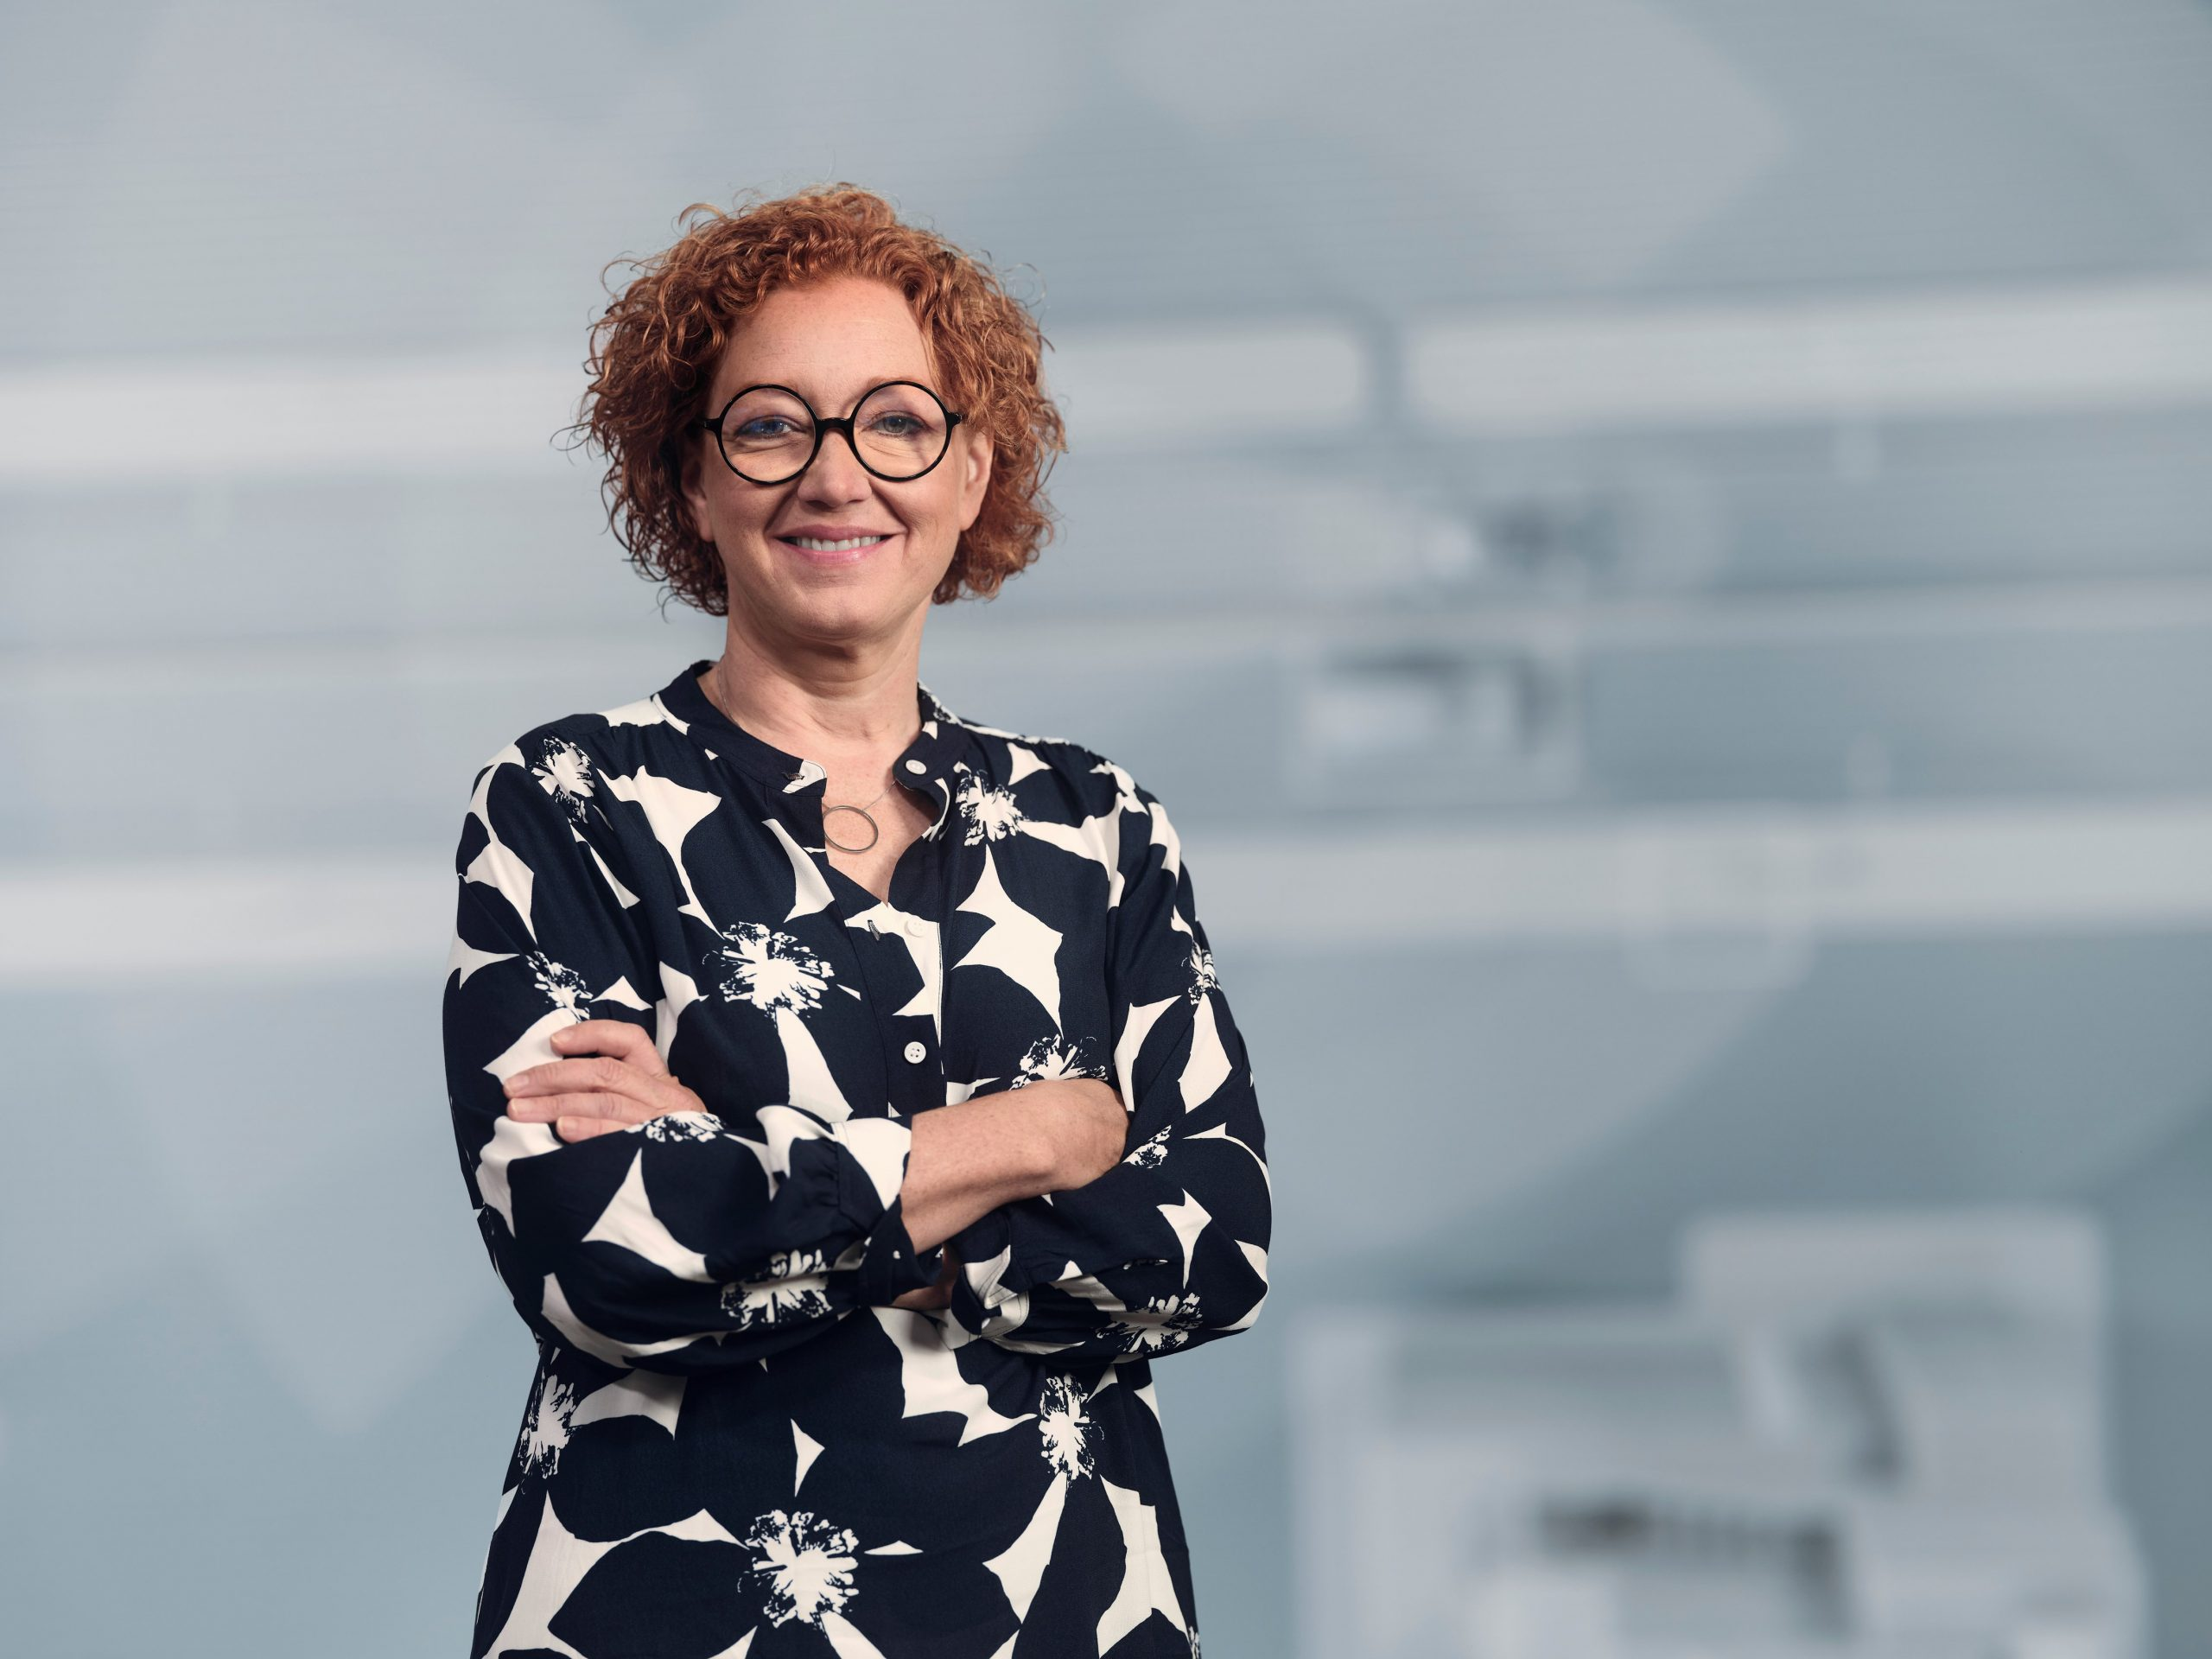 283978 dg rd Andersson CEO Zenseact scaled Πως η Volvo θα αξιοποιεί τα δεδομένα σε πραγματικό χρόνο για μεγαλύτερη ασφάλεια Volvo, Volvo Cars, ασφάλεια, ειδήσεις, Νέα